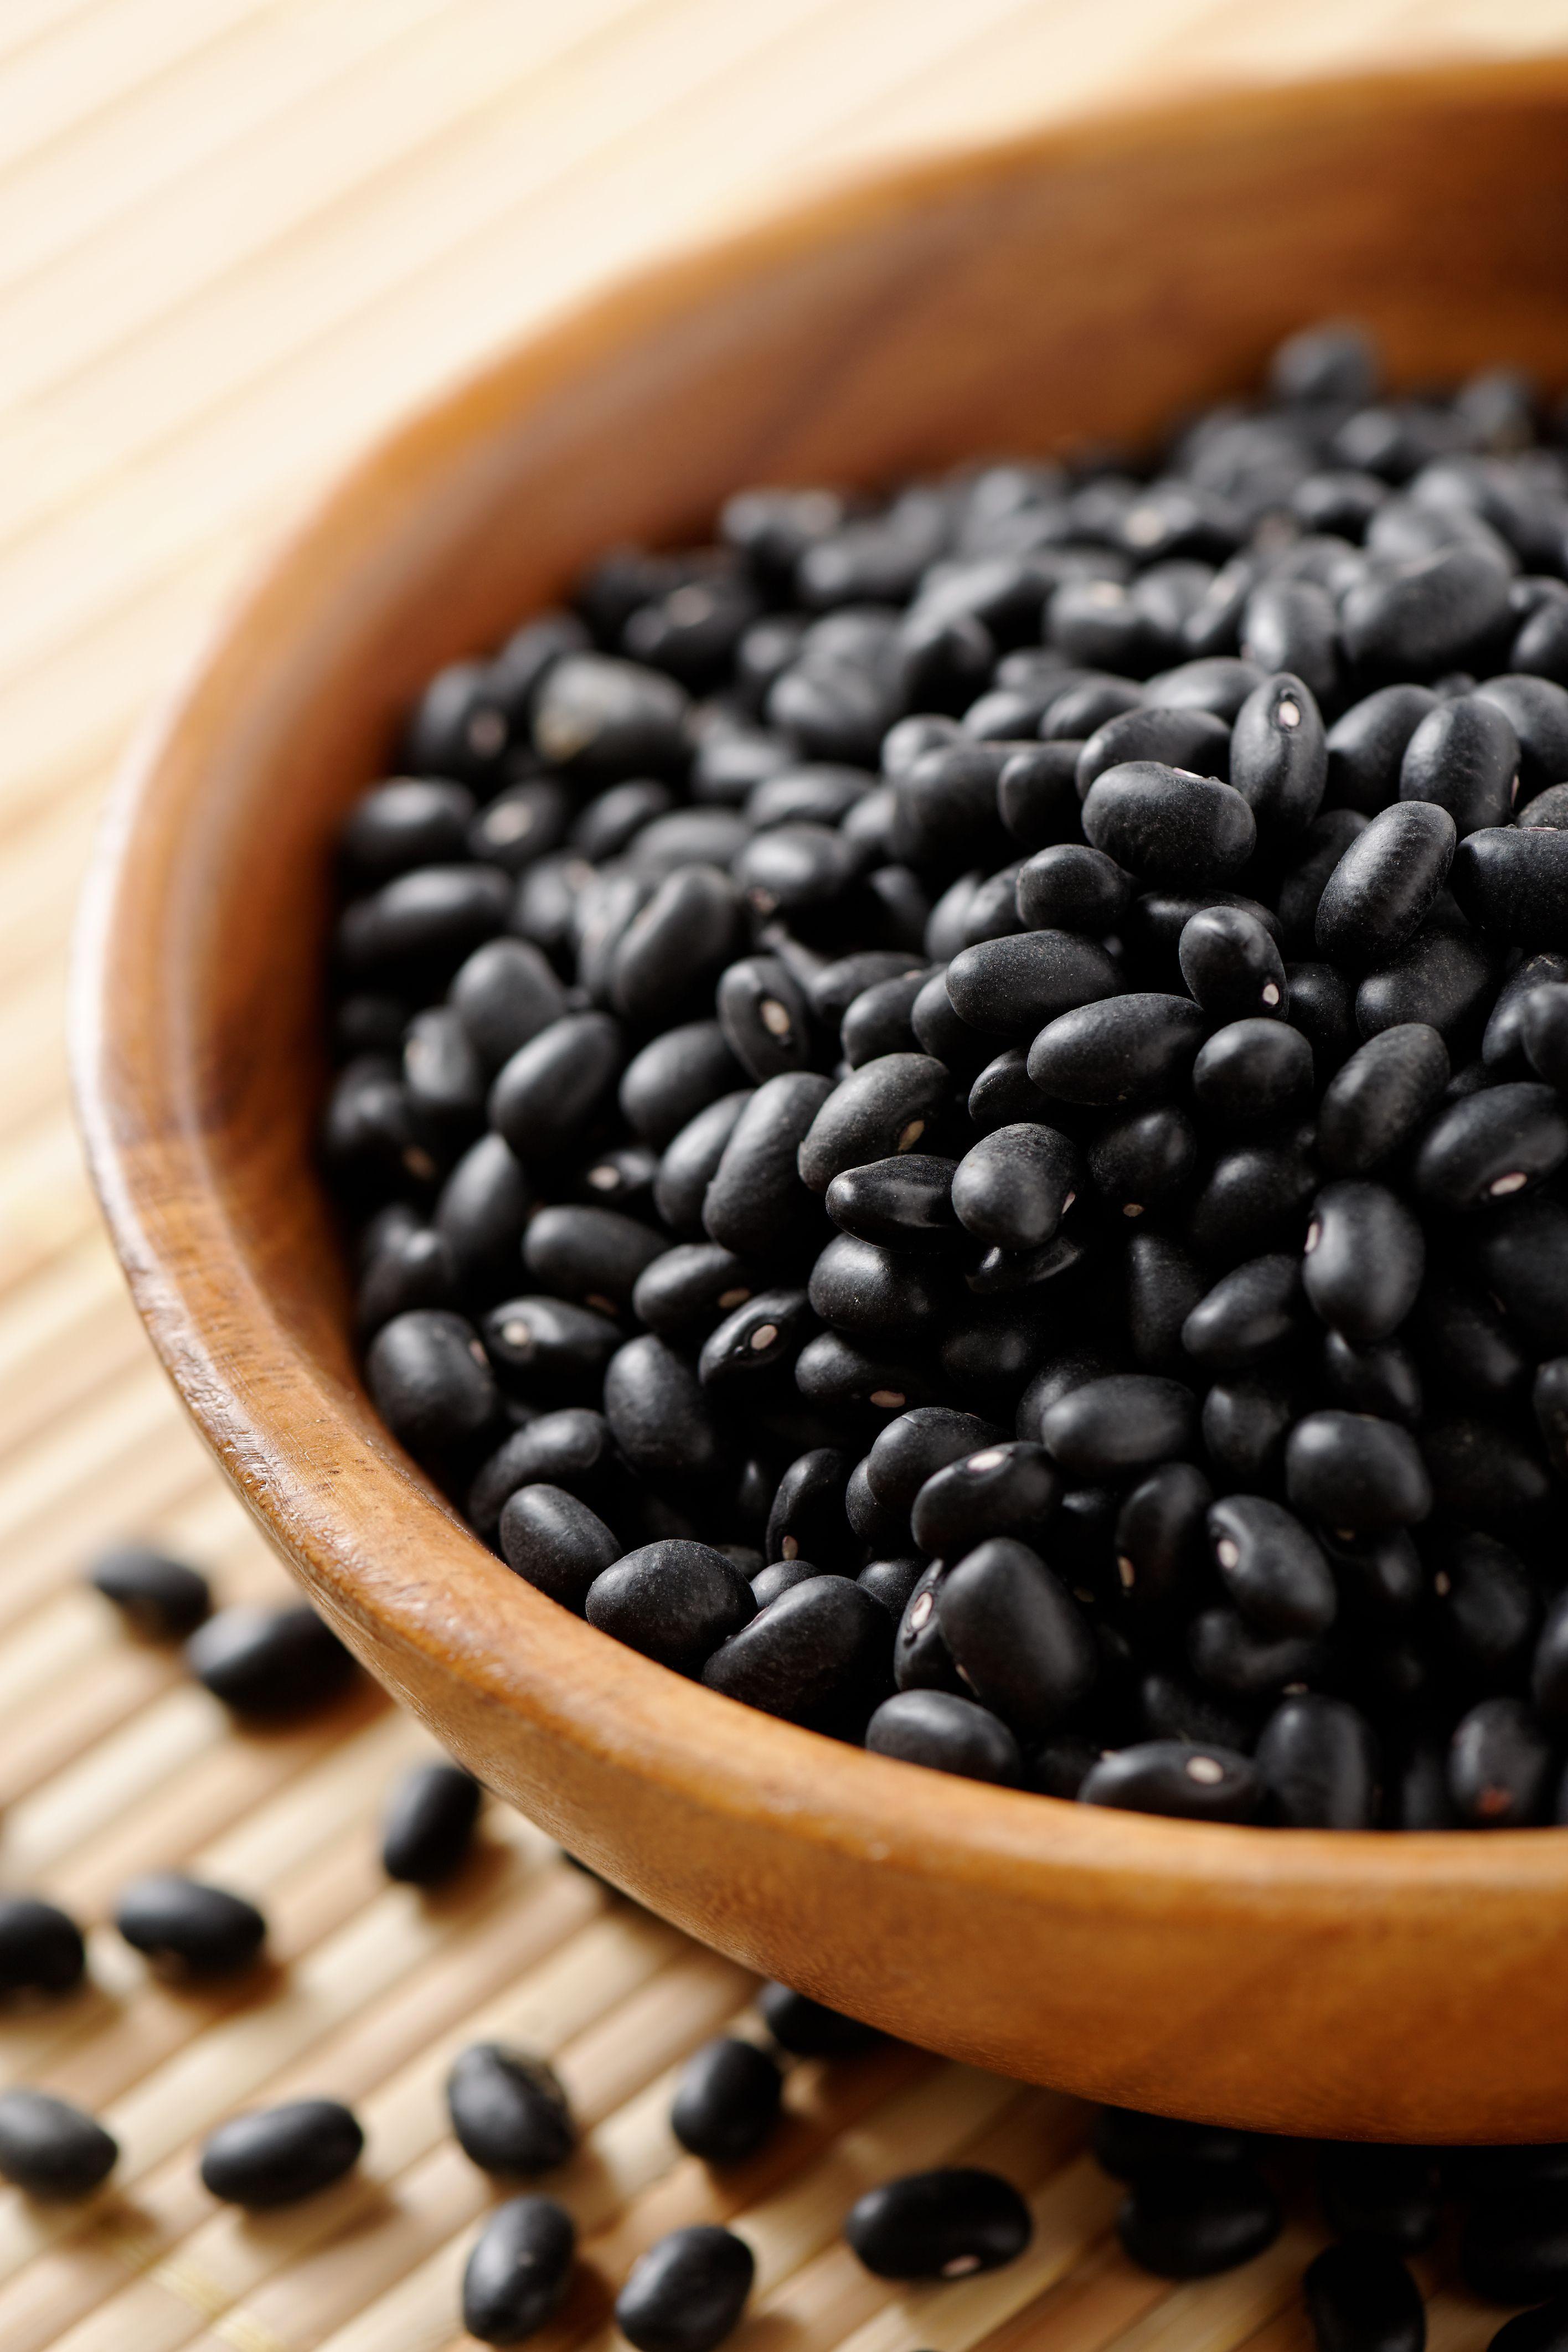 Fresh black beans in wooden bowl